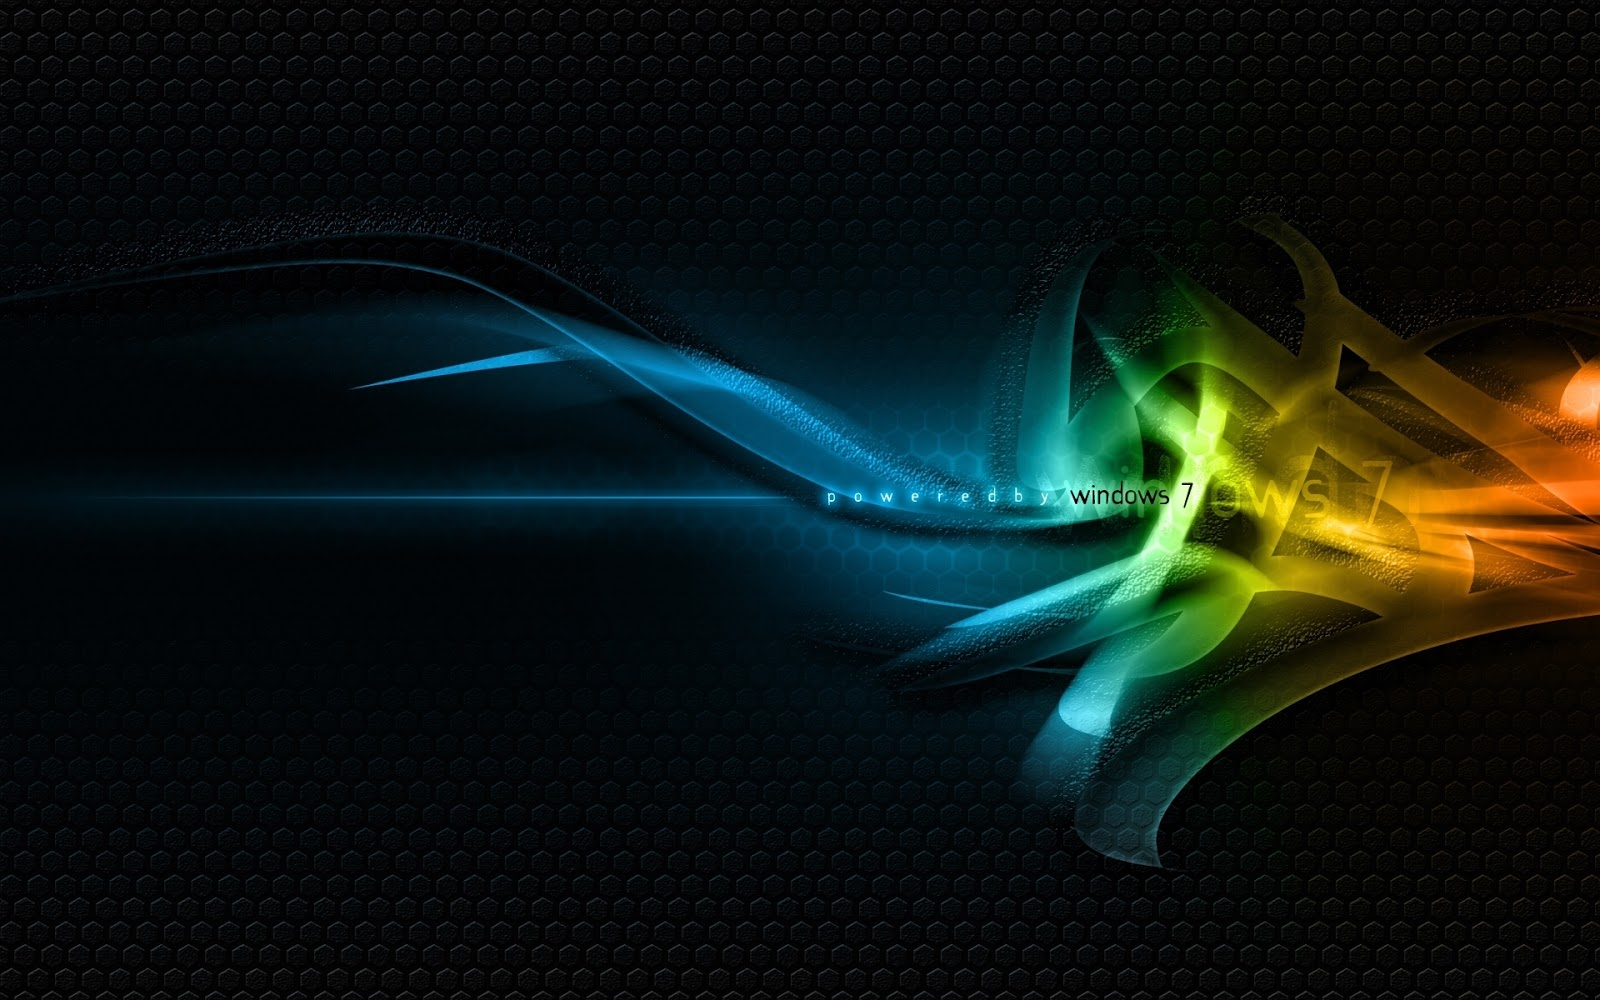 http://3.bp.blogspot.com/-__WY6tWmY_E/UMor1Ywf2II/AAAAAAAABg4/MjgdtKGVS-M/s1600/1920x1200.jpg